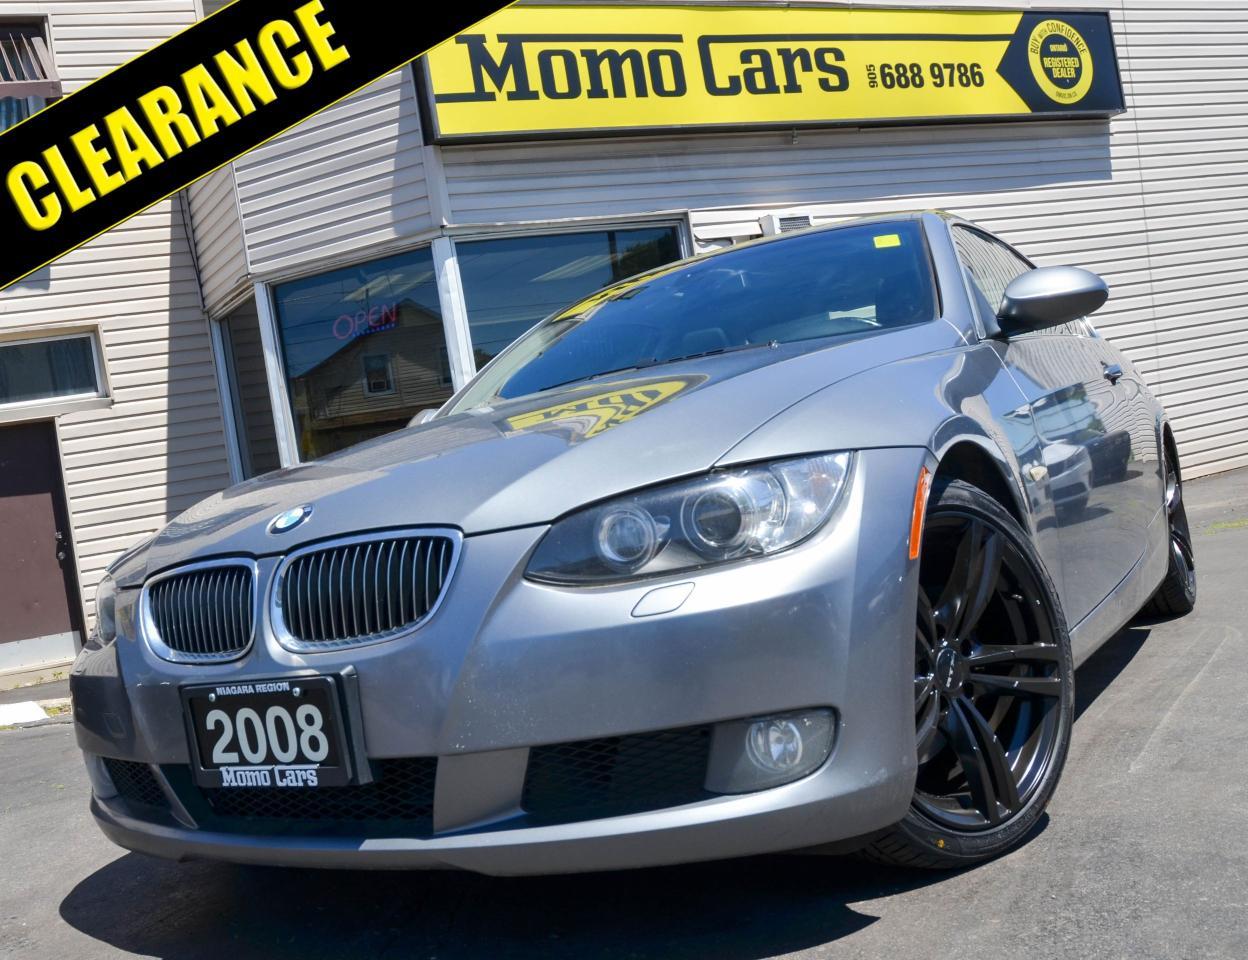 2008 BMW 3 Series NAV! Sunroof! Leather! ONLY $188/bi-weekly!